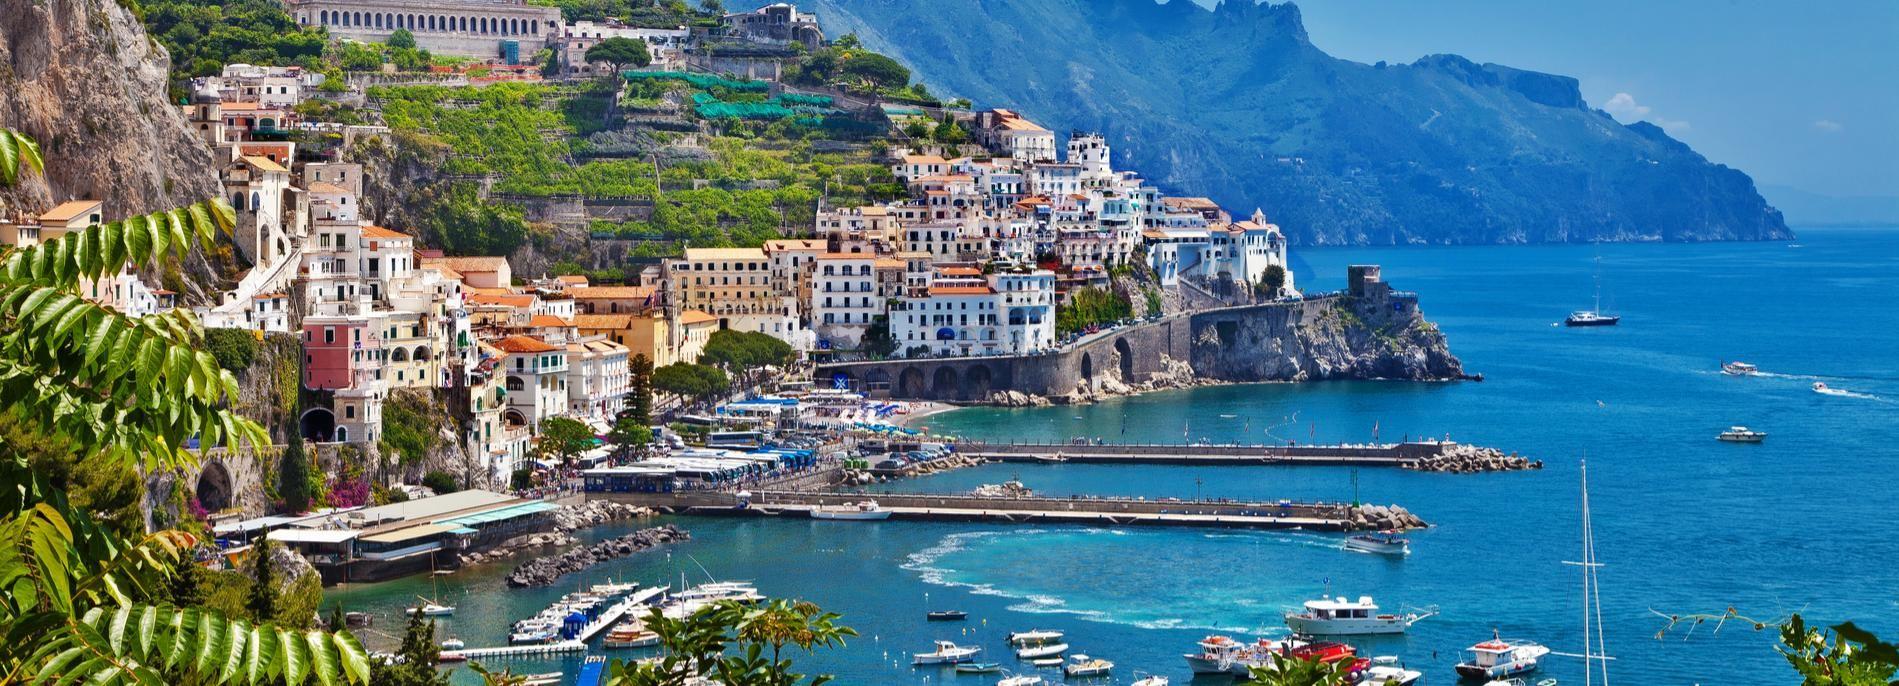 De Sorrento: Excursion privée Positano, Amalfi et Ravello